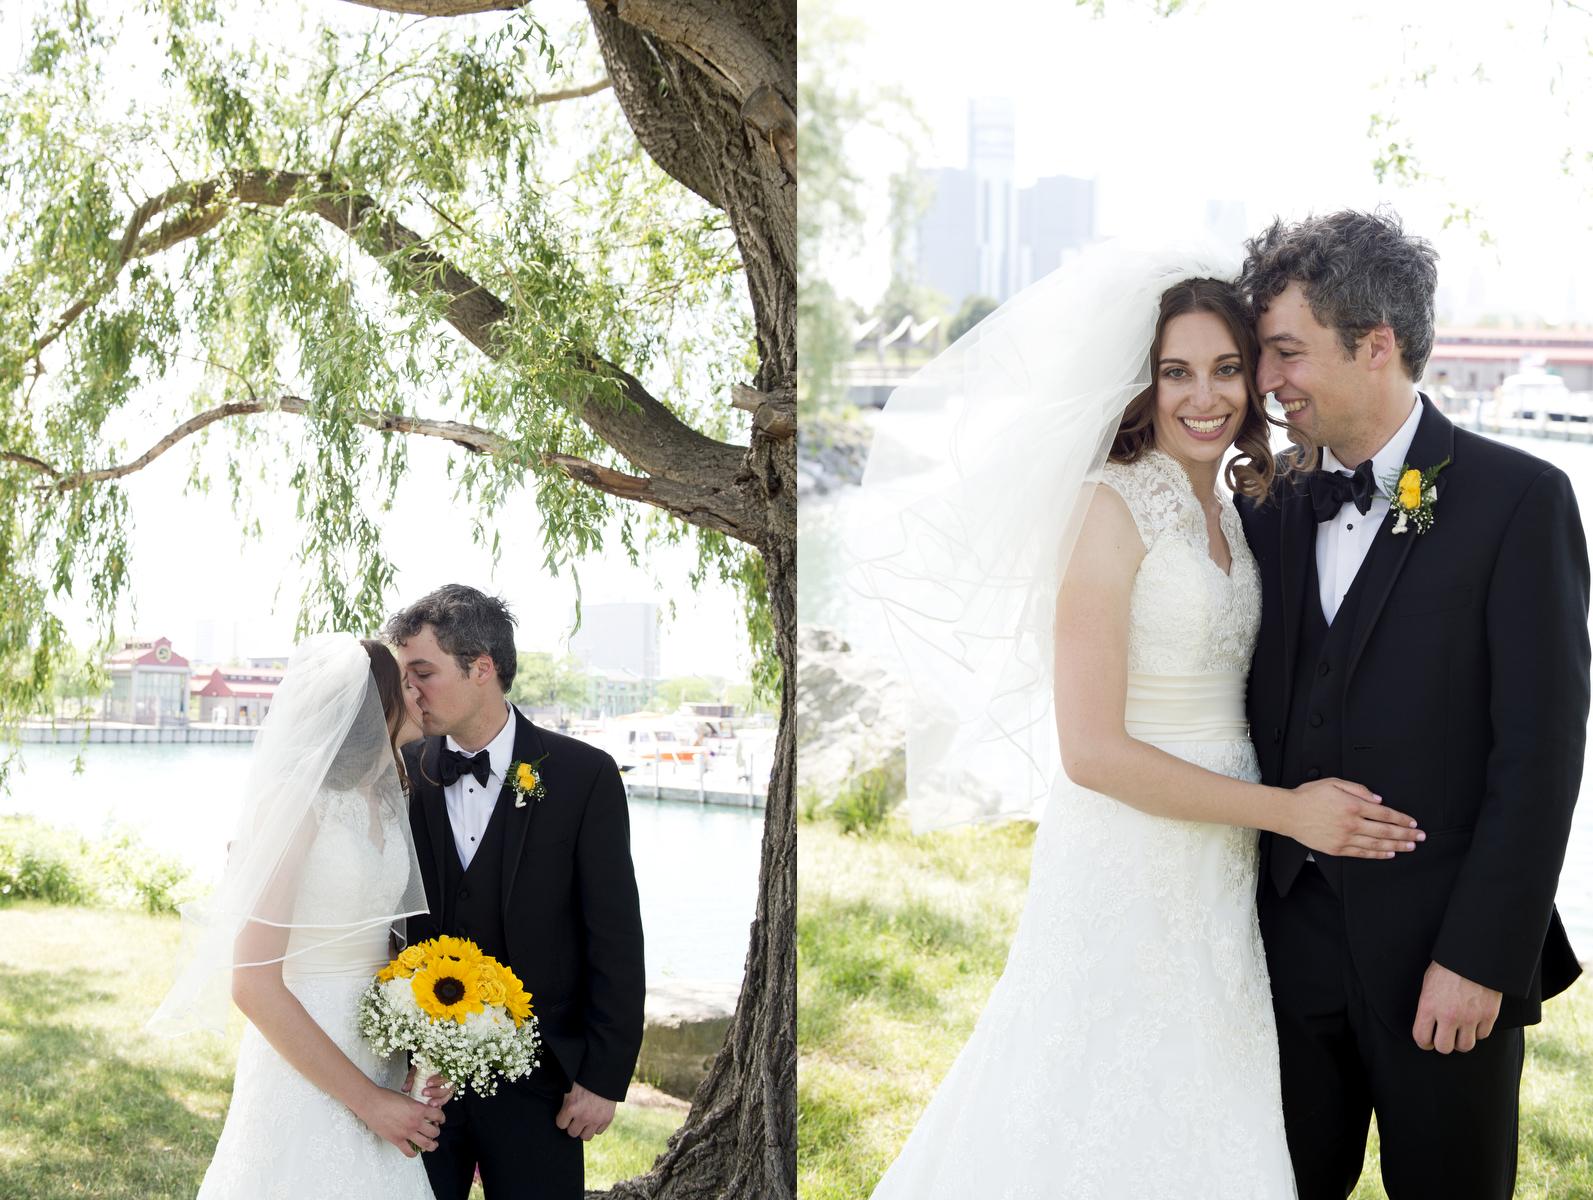 061116 WEDDING Daphna & Keith 94.JPG